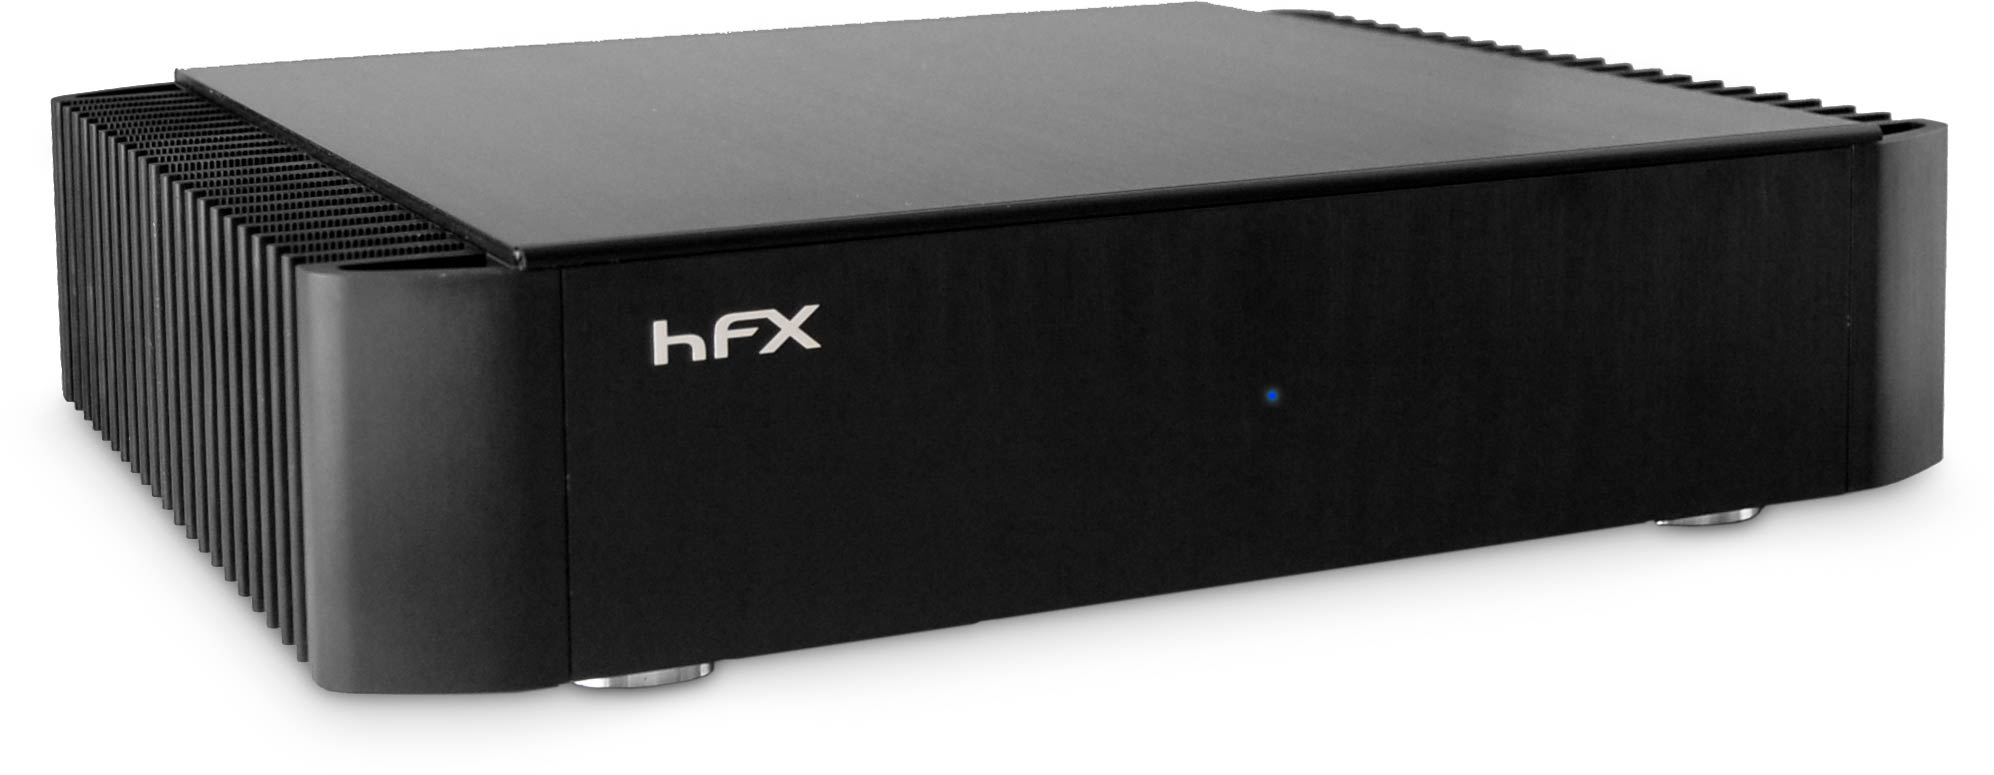 Hfx 573 Mini Class D 1300w 6 Hypex Amplifier